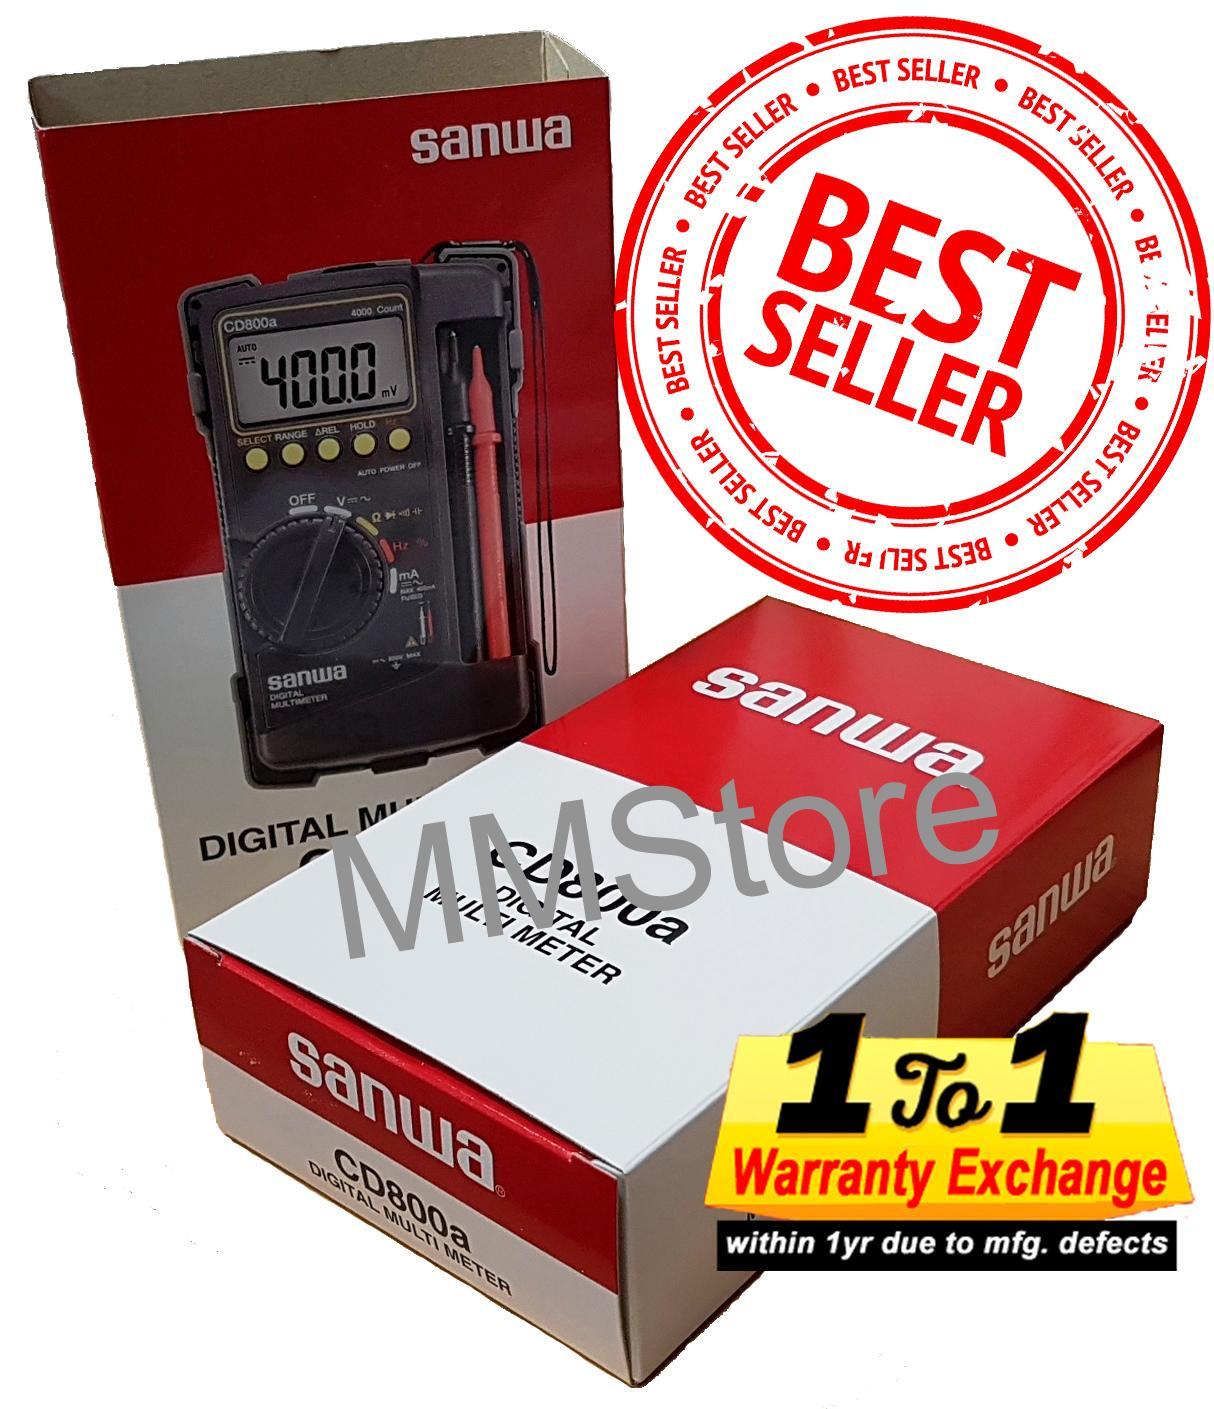 Latest Sanwa Digital Multimeter Cd800A